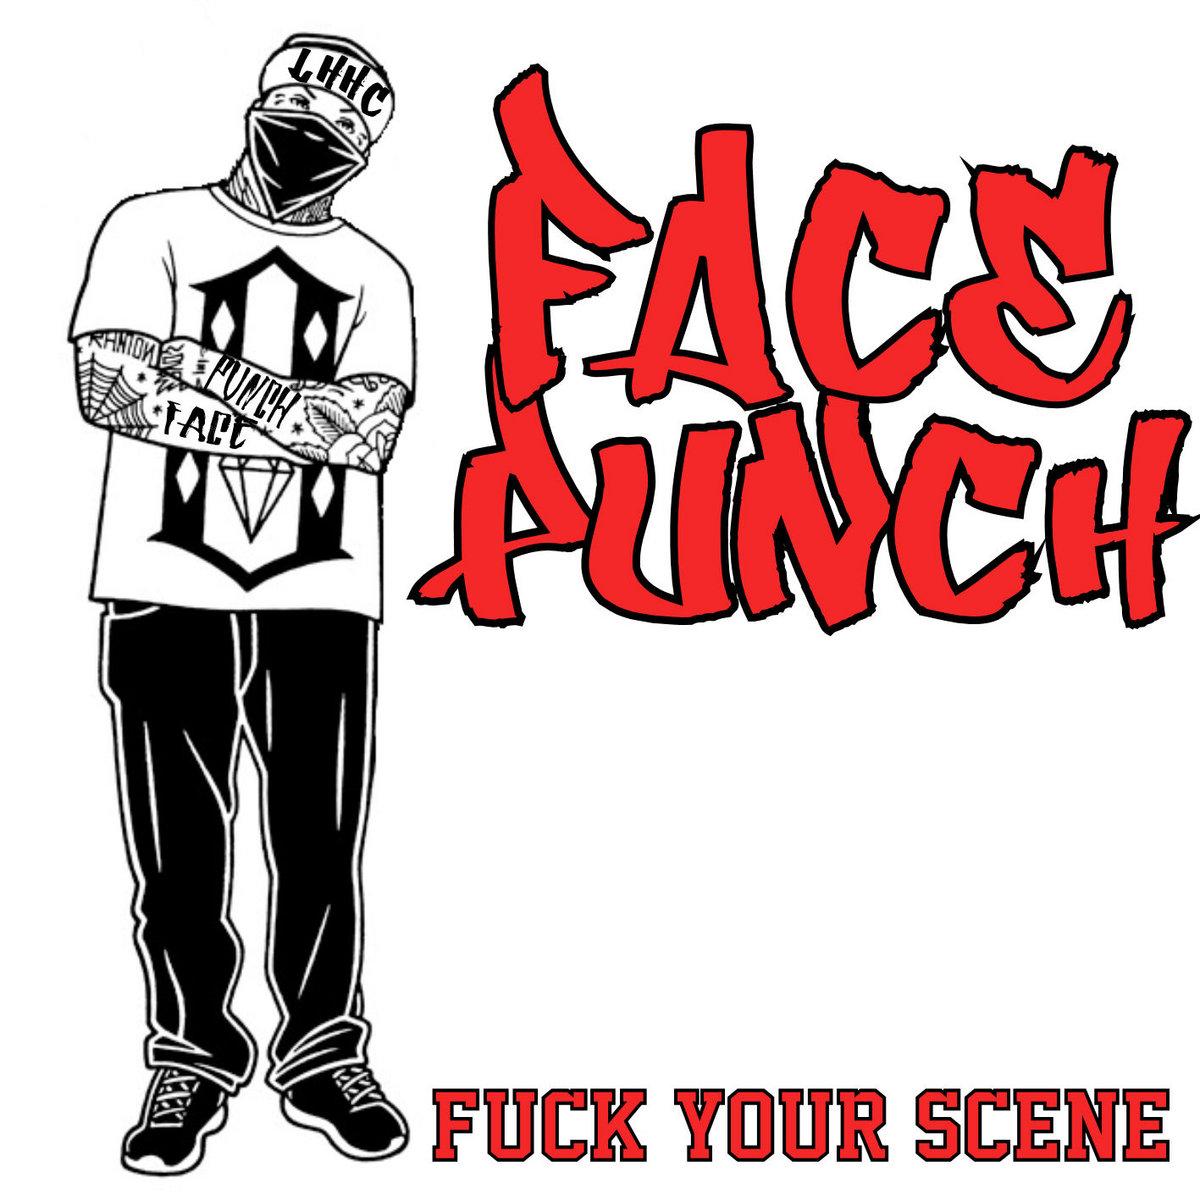 Fuck Your Scene